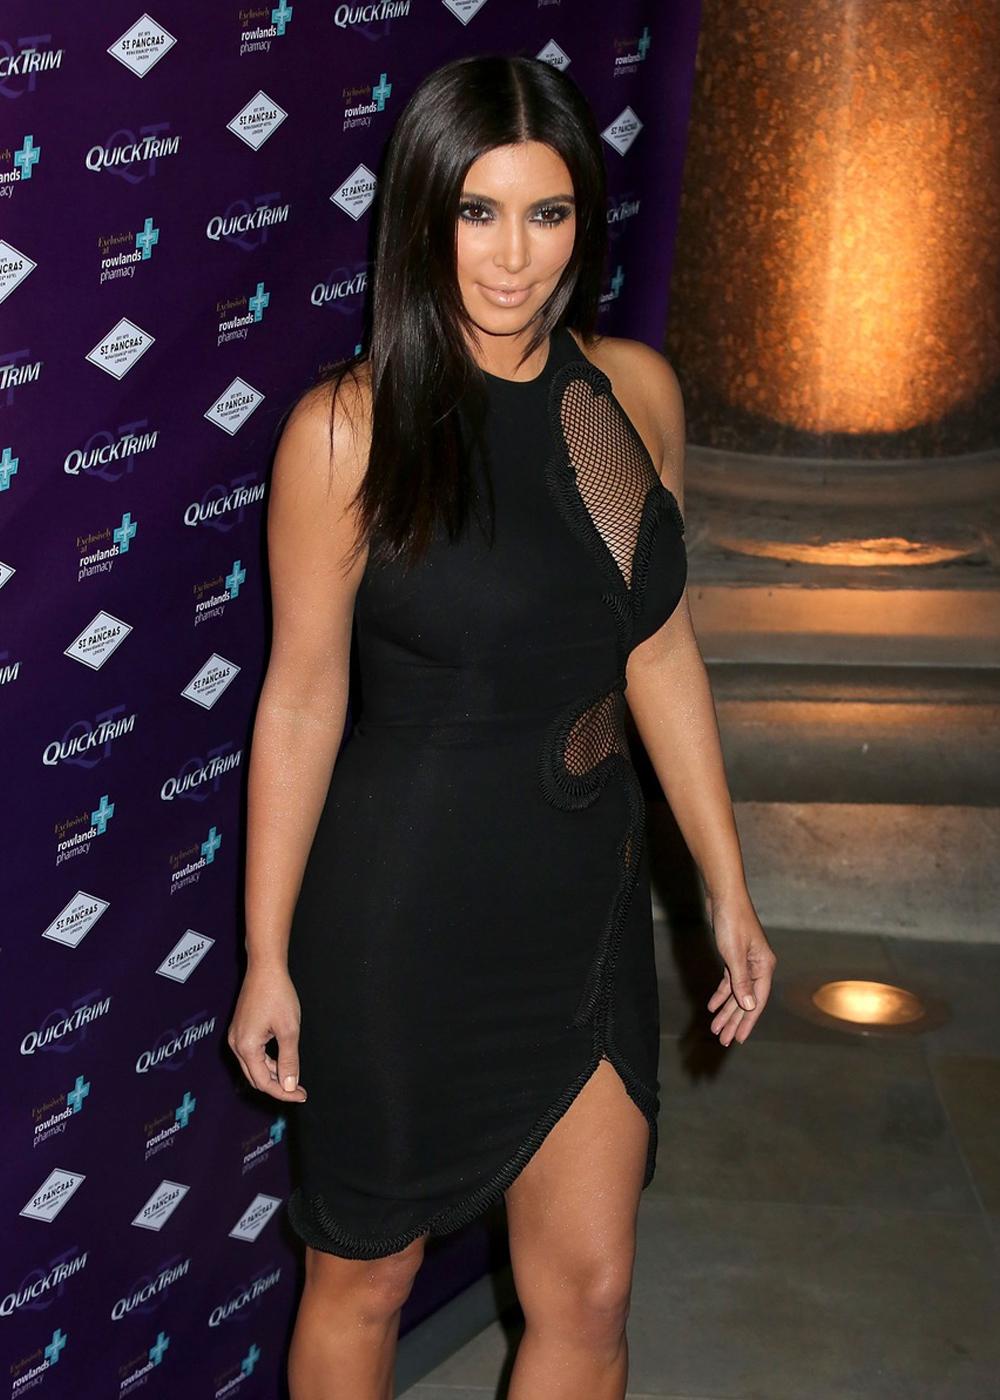 Kim Kardashian Quick Trim press event